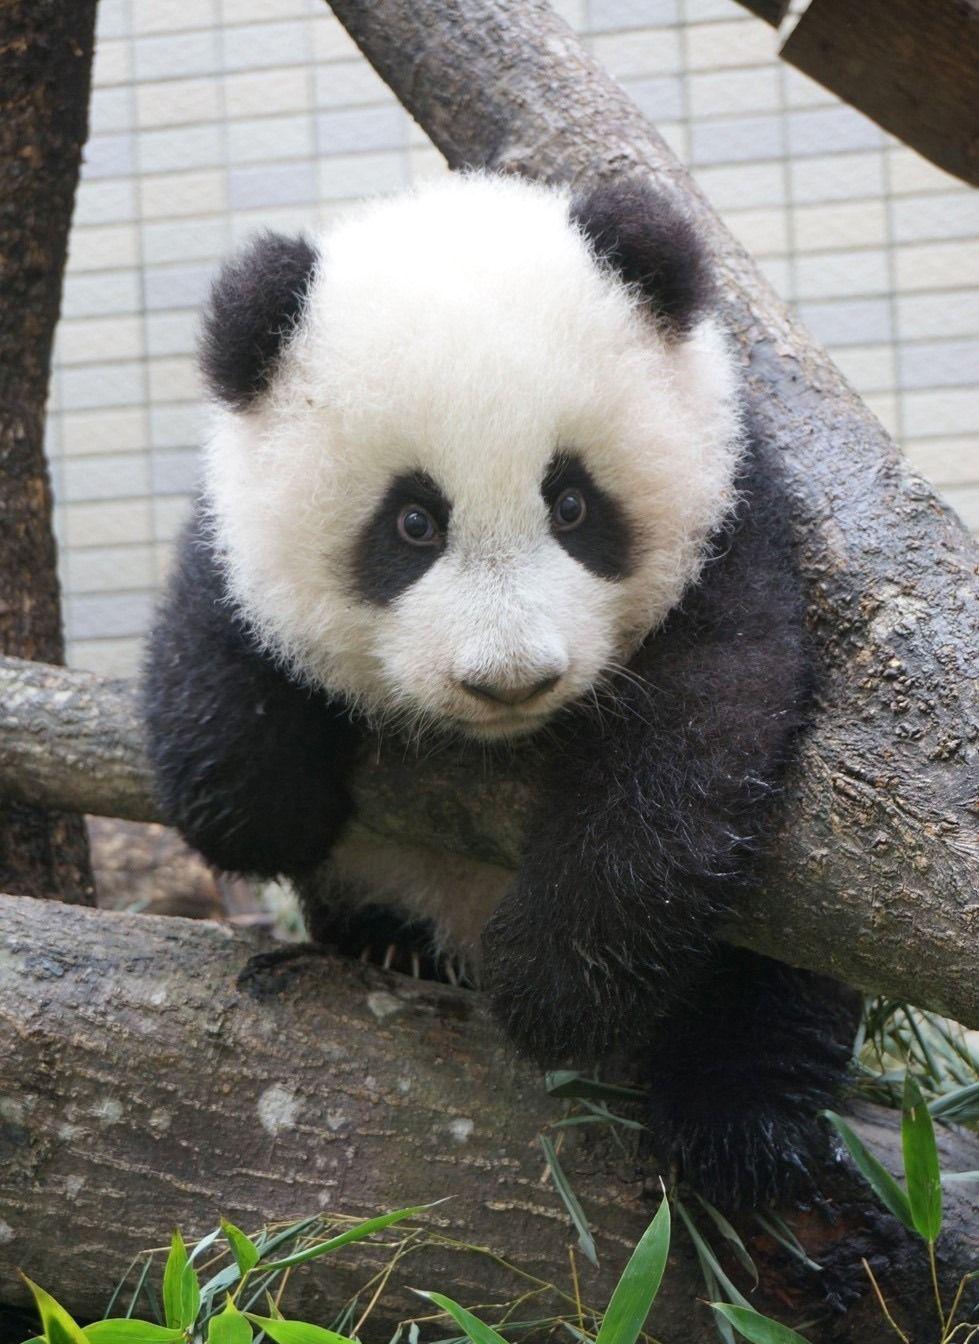 baby panda bear   Perfectly Panda   Pinterest   Baby panda ... - photo#33